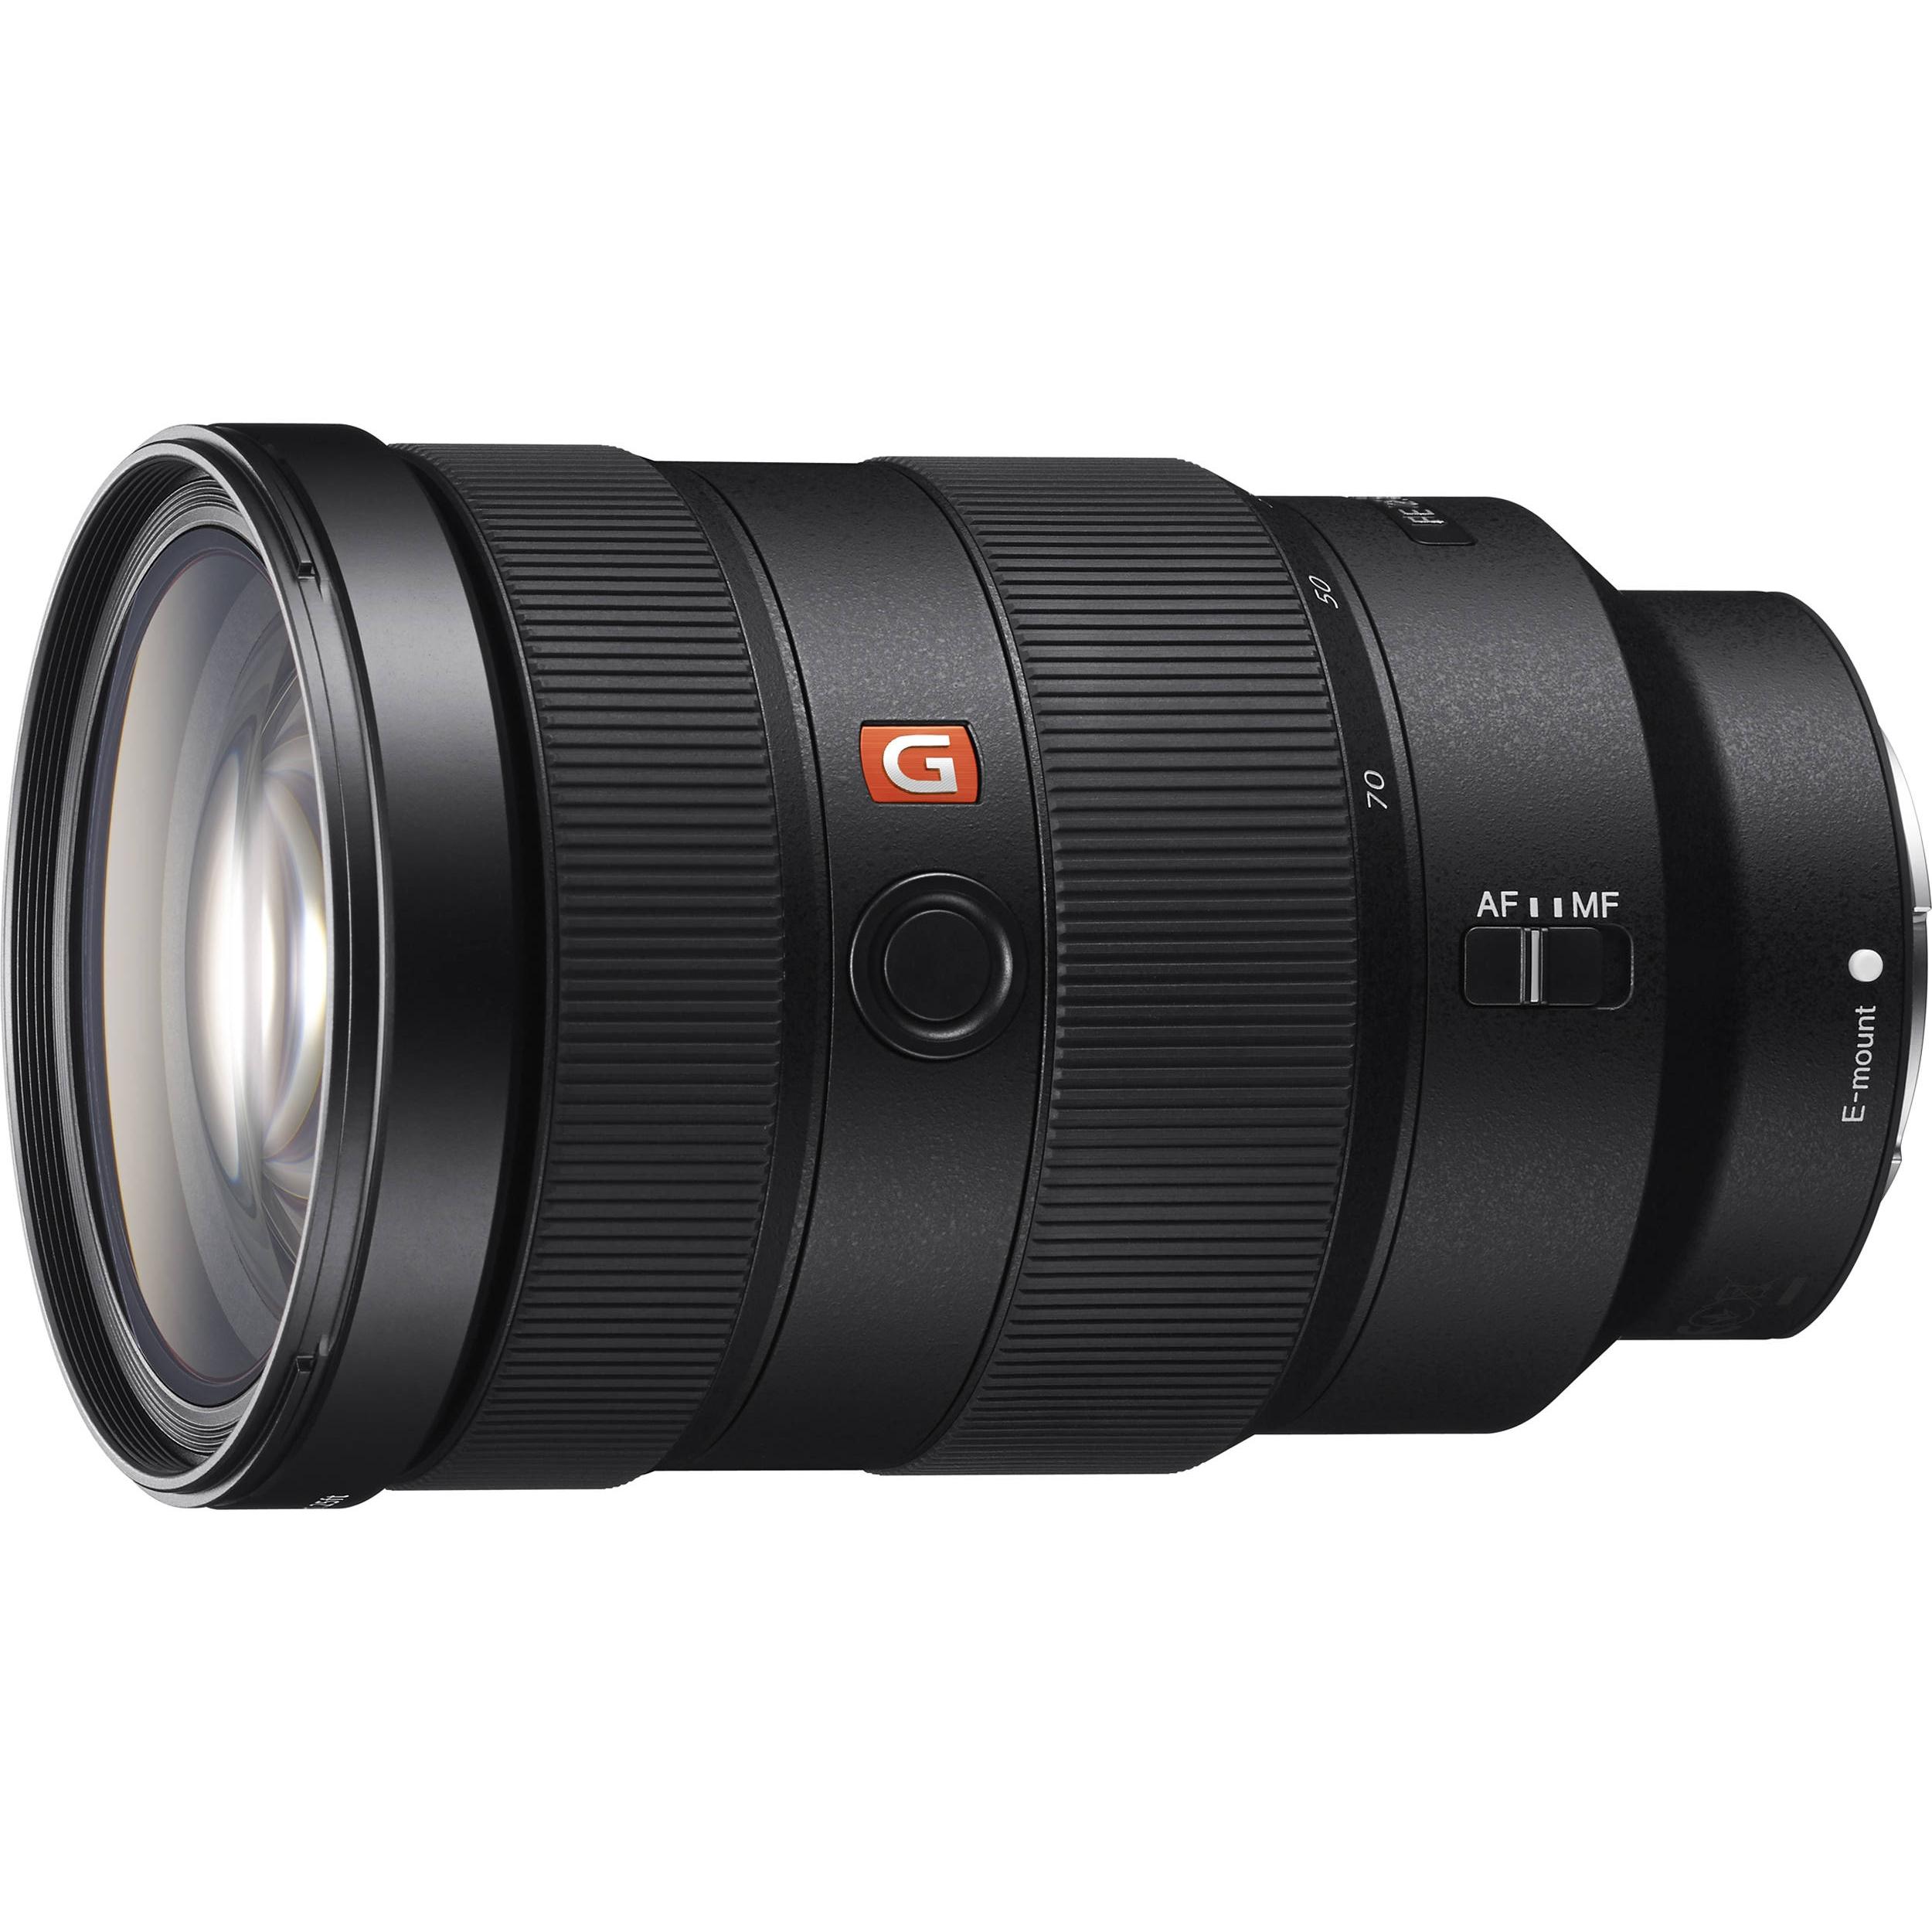 Sony FE 24-70mm f2.8 GM   - E-mount Full Frame format - G Master Standard zoom - Unprecedented resolution and detail